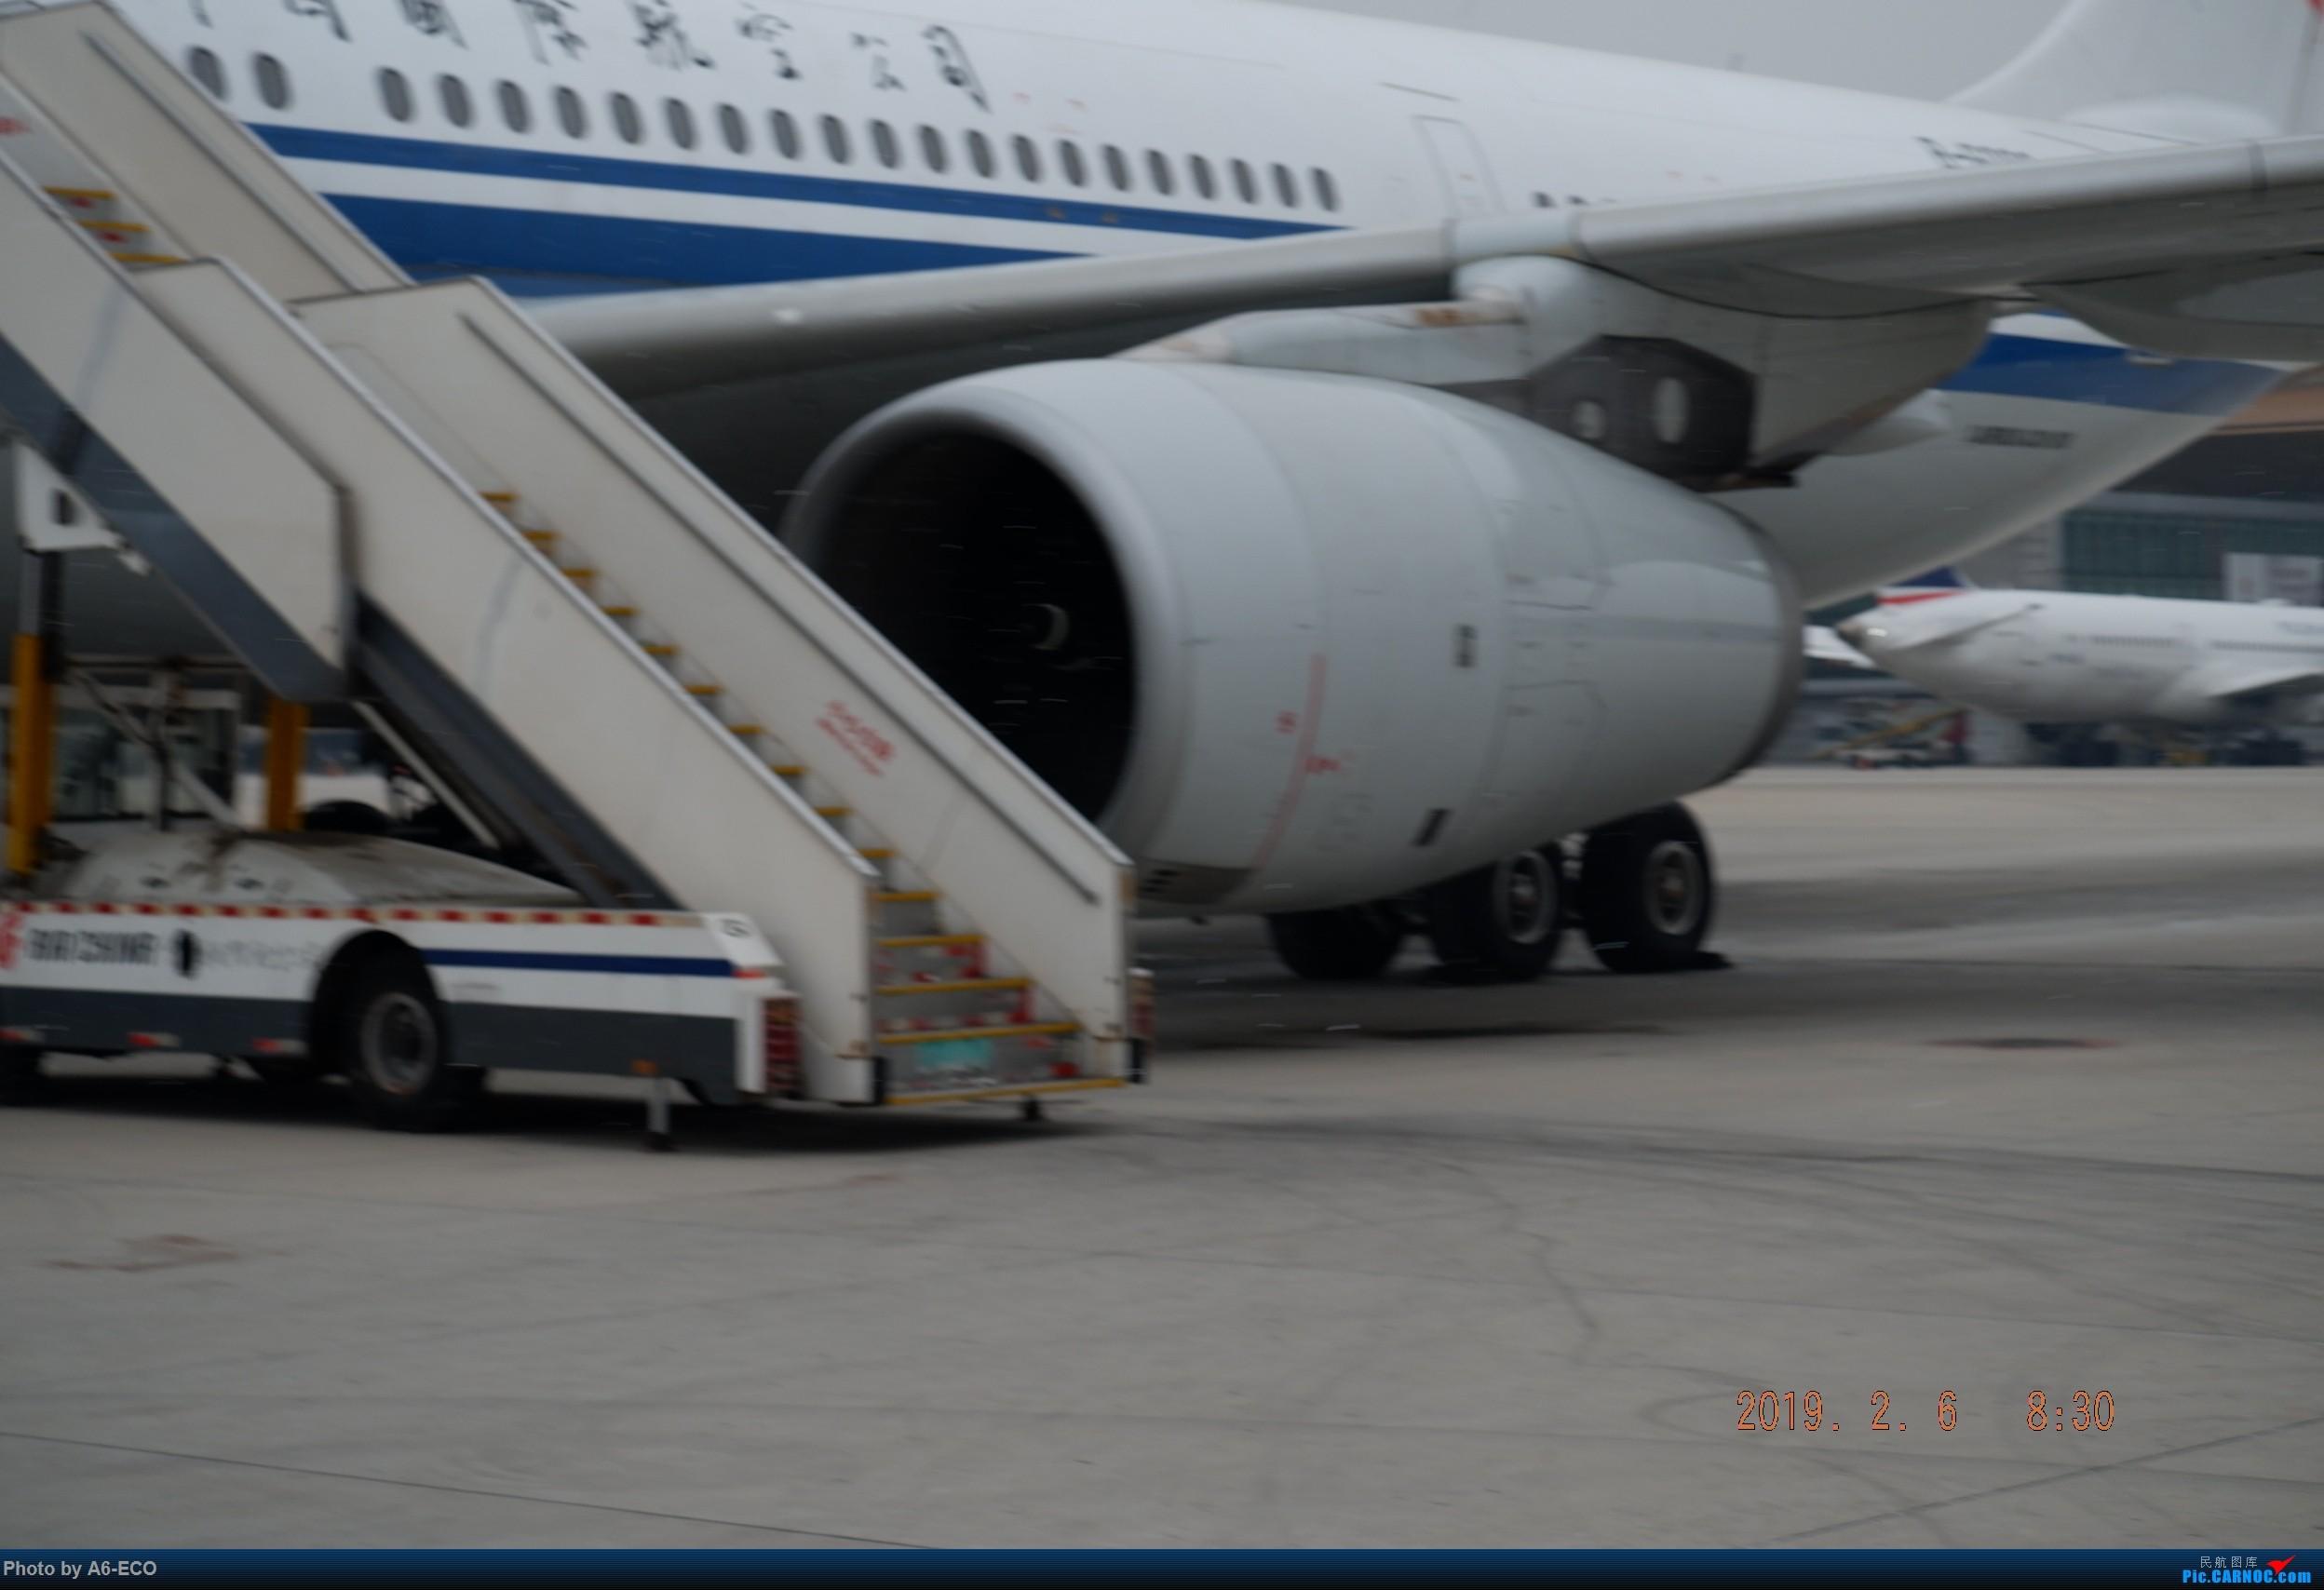 Re:[原创]#Siri旅行003#pek-nrt,繁华的东京 AIRBUS A330-200 B-6092 中国北京首都国际机场